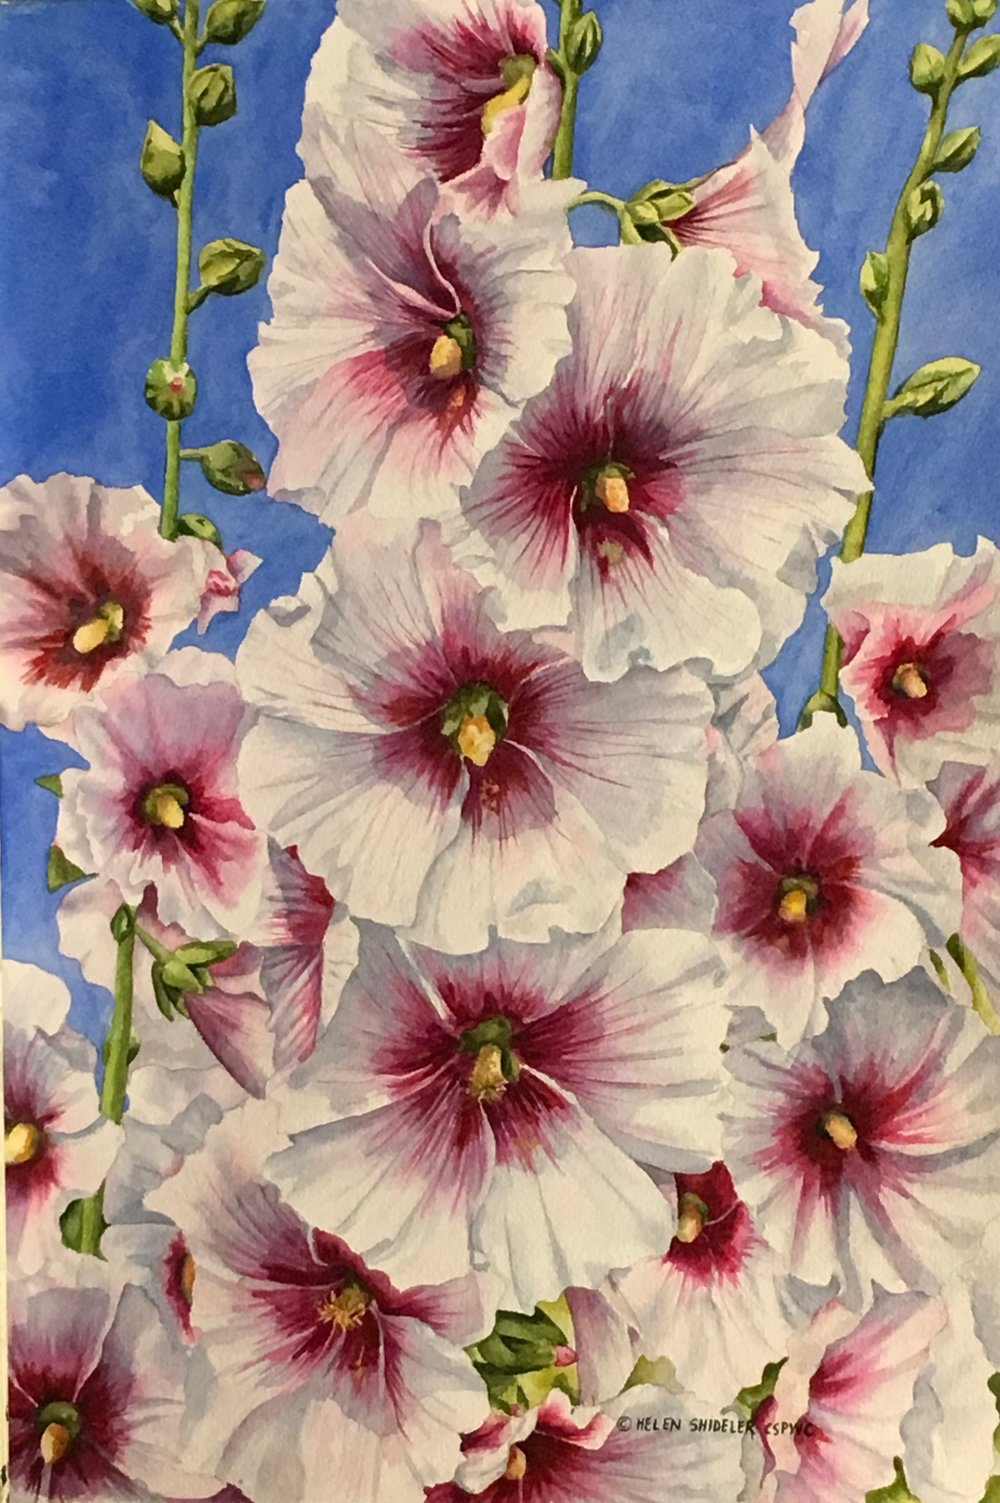 Country Garden Favourite by Helen Shideler